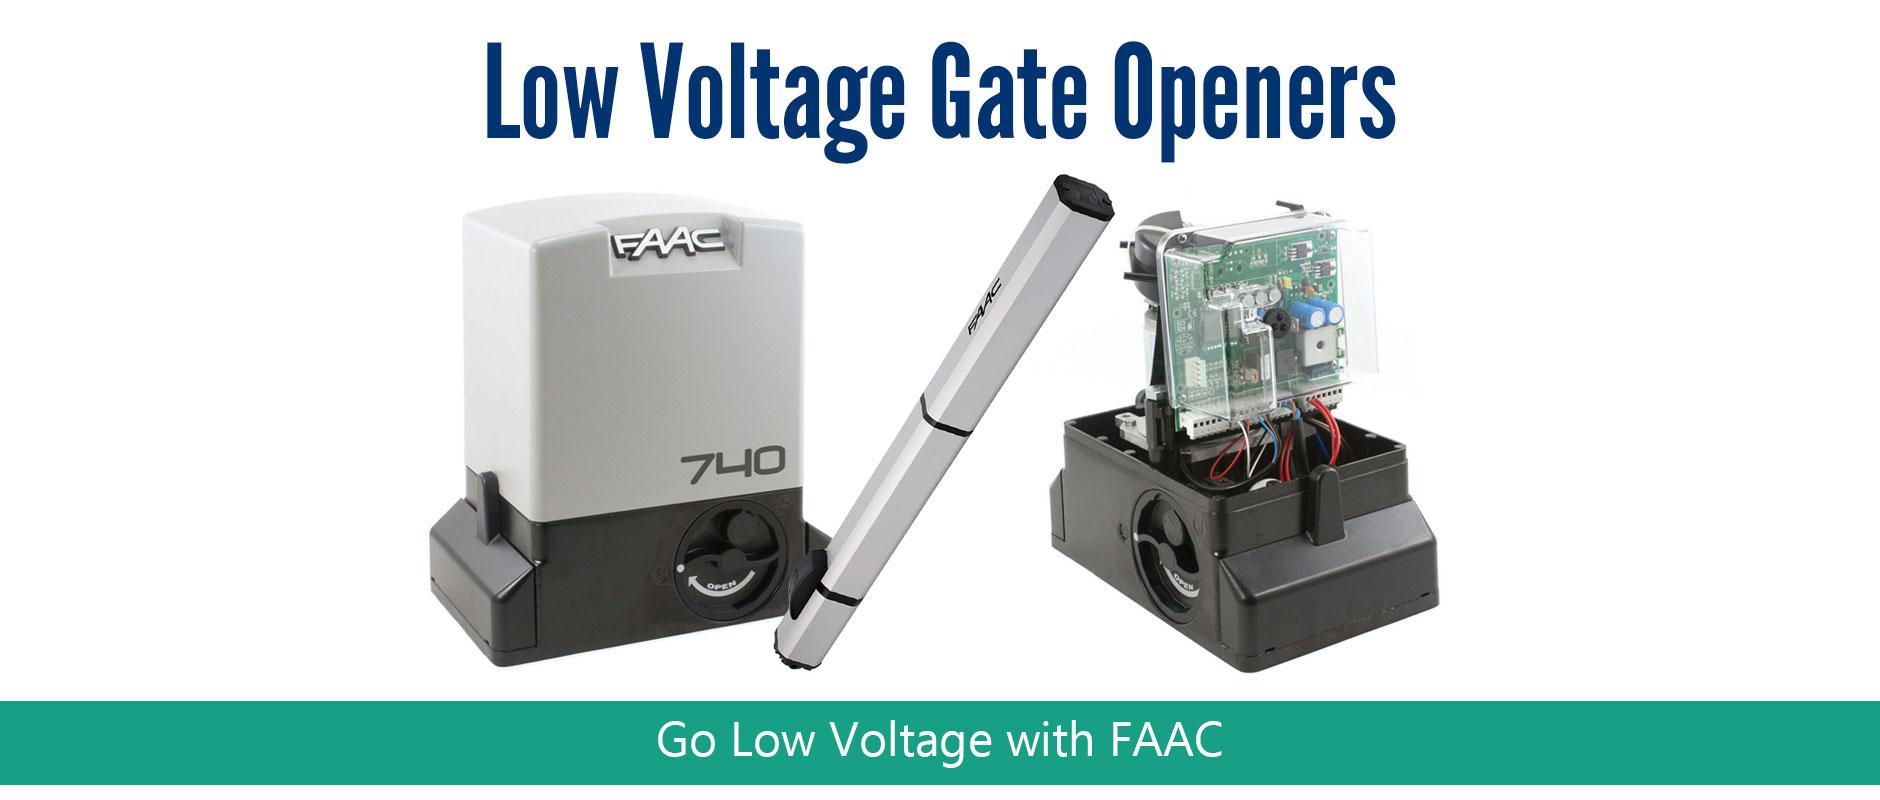 faac gate openers access controls fast gate openers. Black Bedroom Furniture Sets. Home Design Ideas